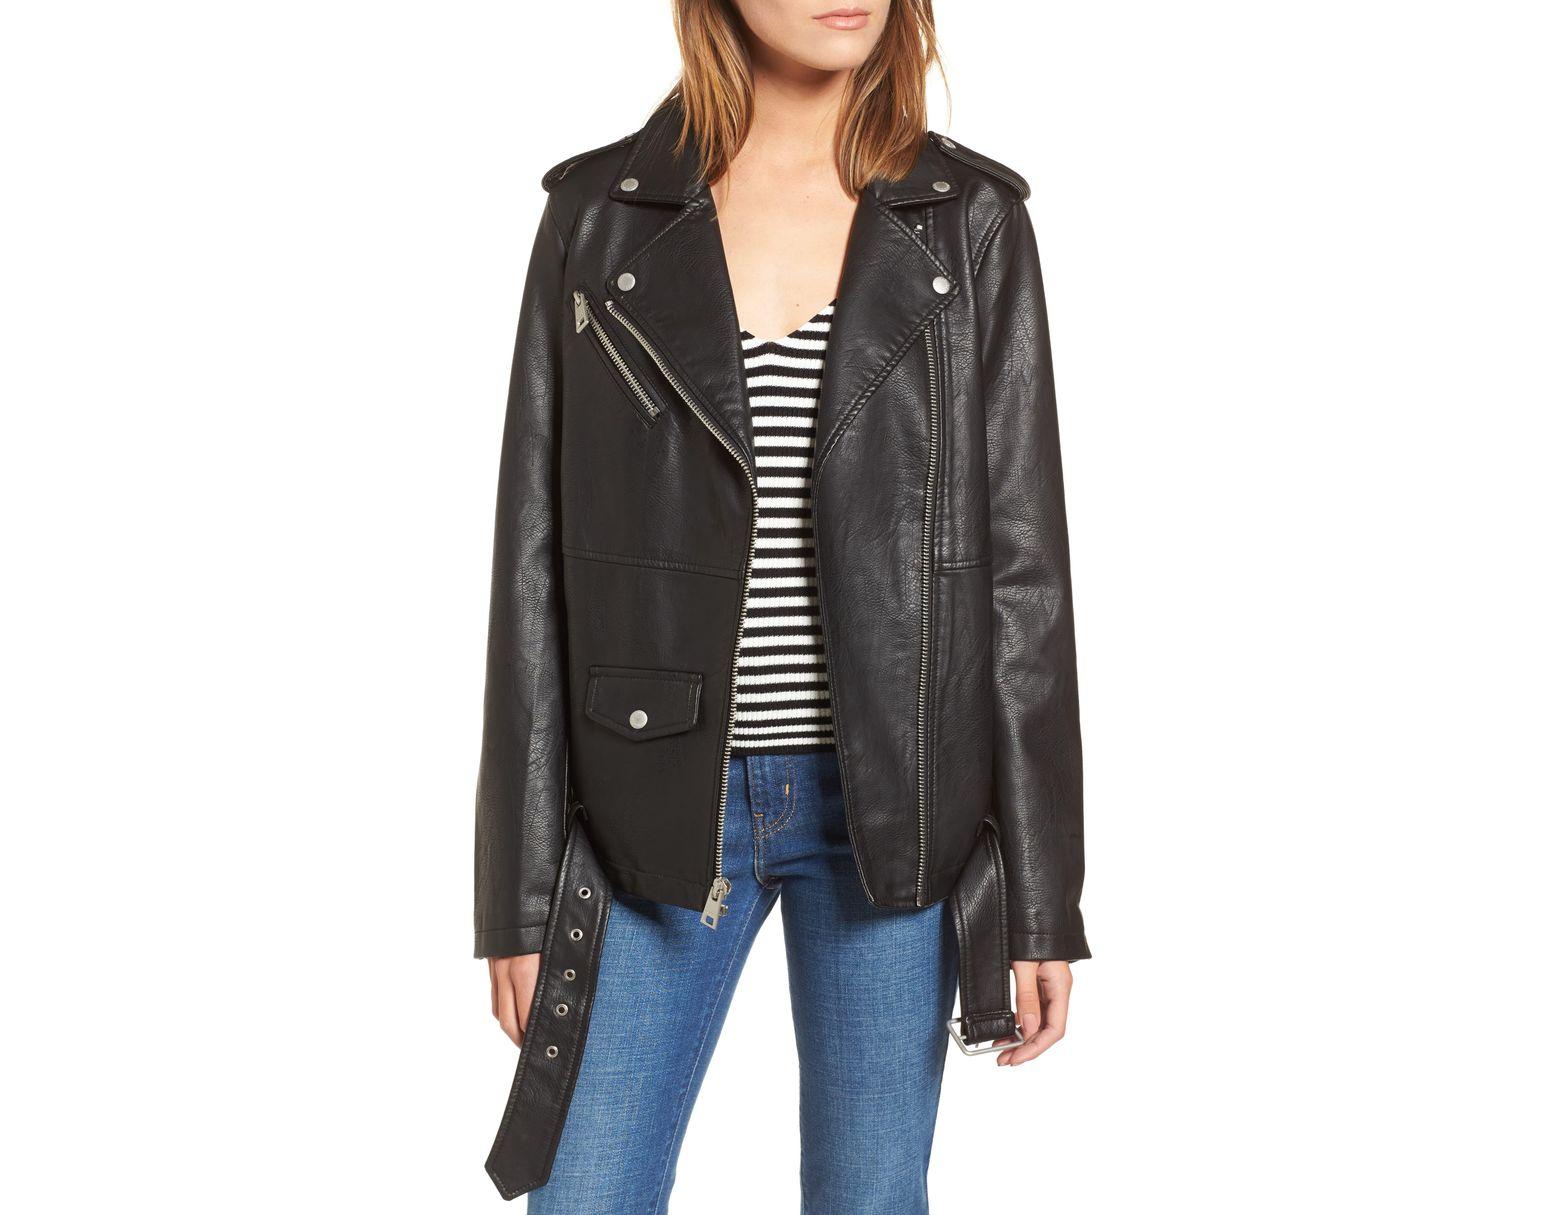 a35452321 Women's Black Oversize Faux Leather Moto Jacket